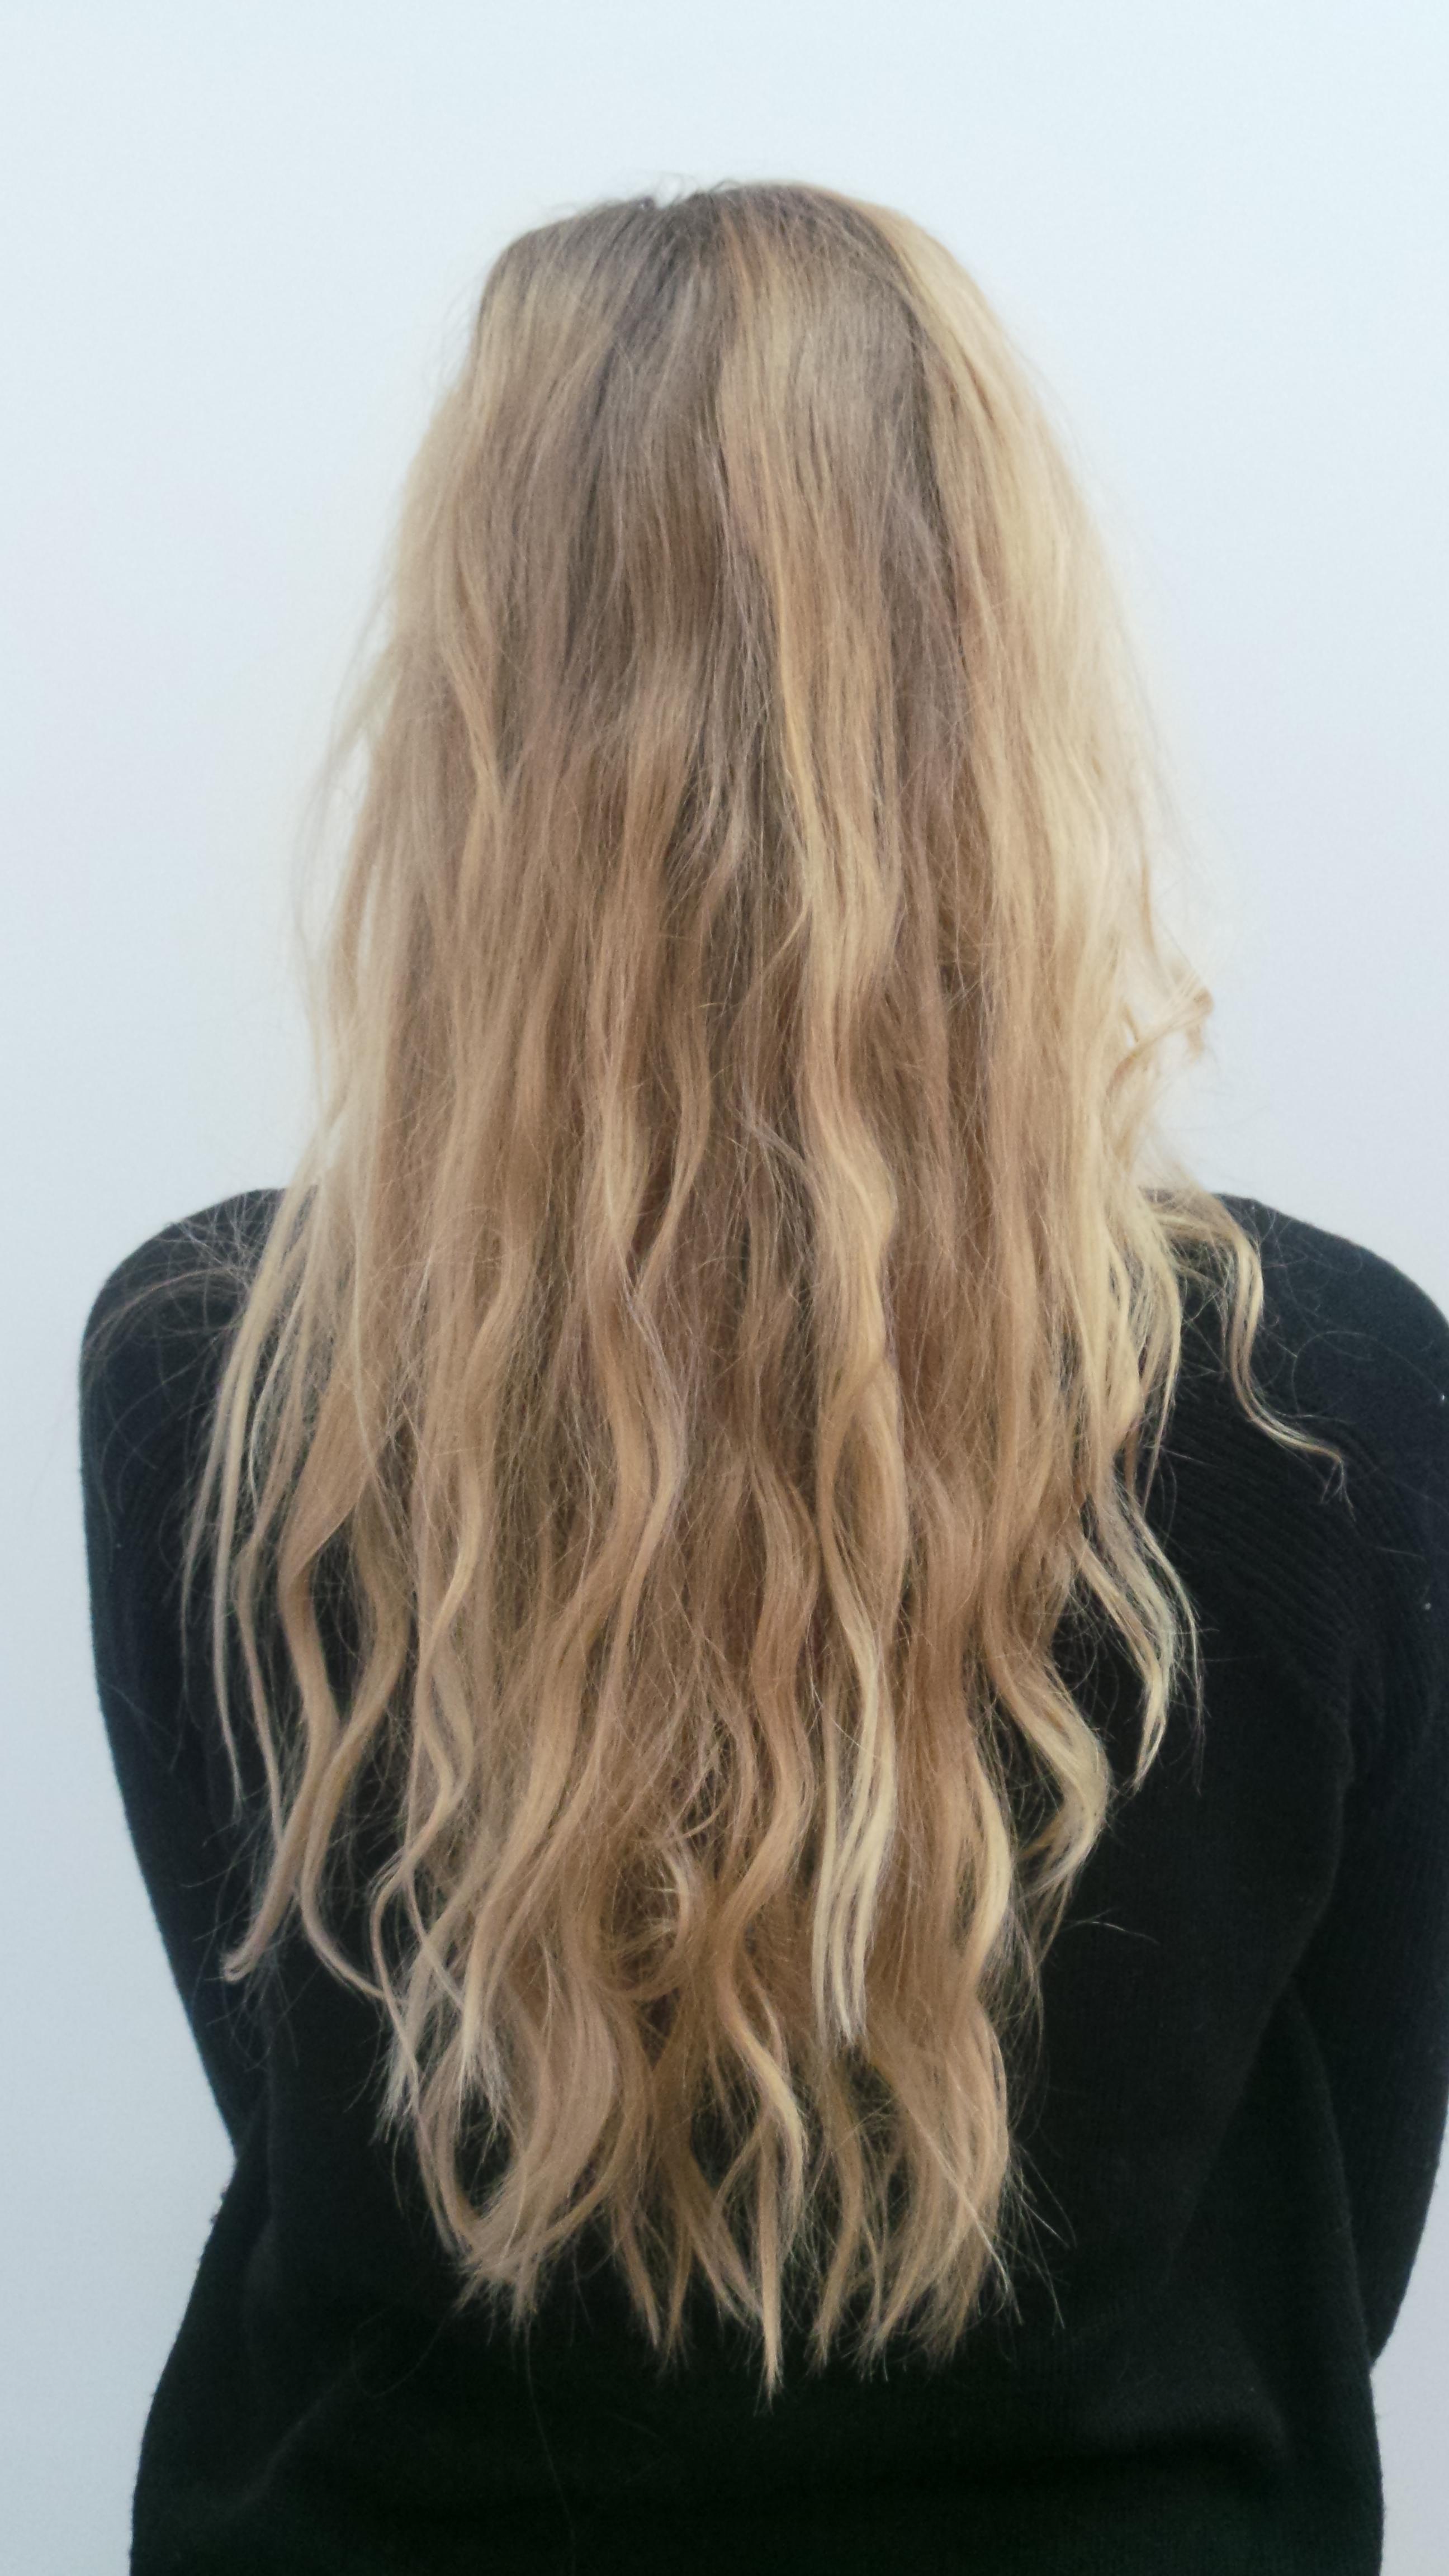 Farida B, Avis farida B, Salon cheveux frisés, salon de coiffure paris, Missglamazone